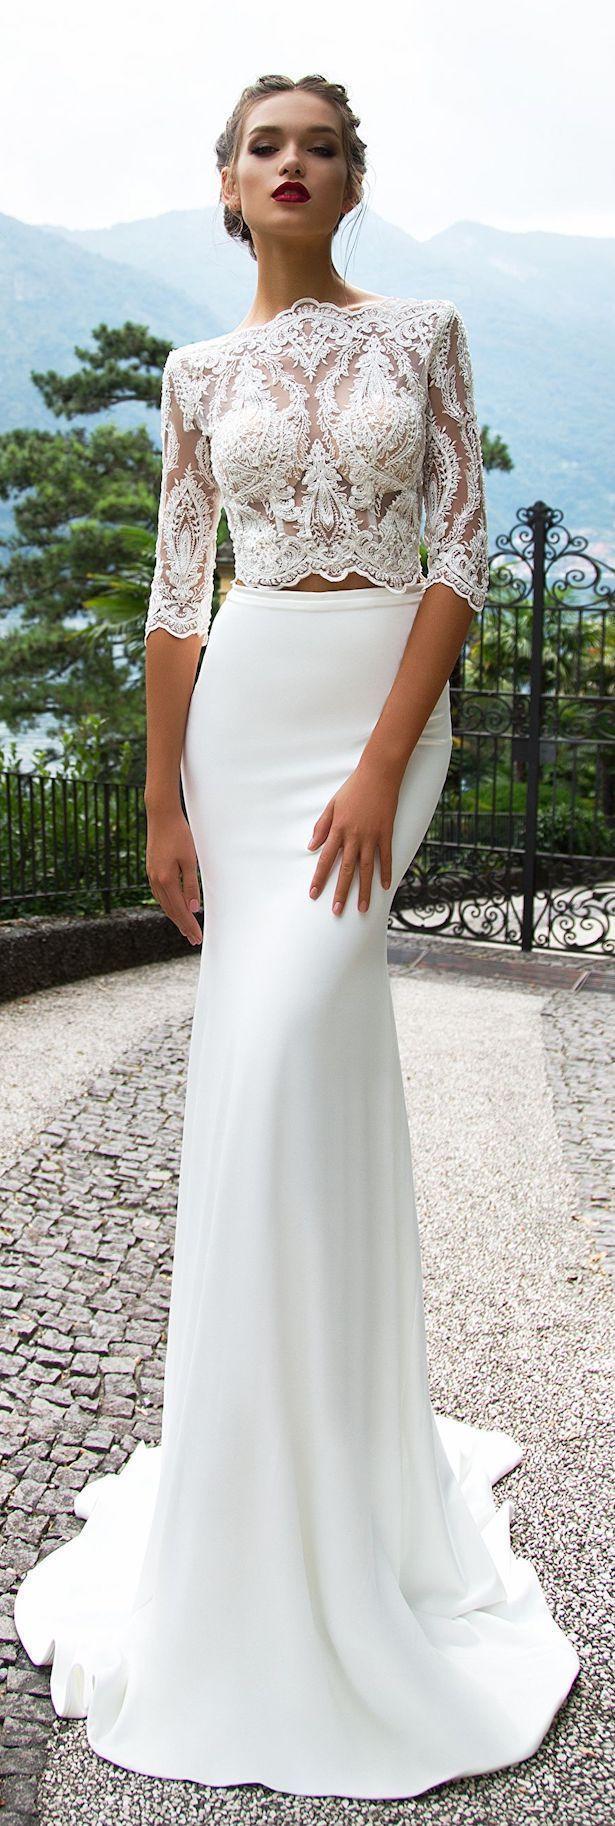 Wedding Dress by Milla Nova White Desire 2017 Bridal Collection – Merill